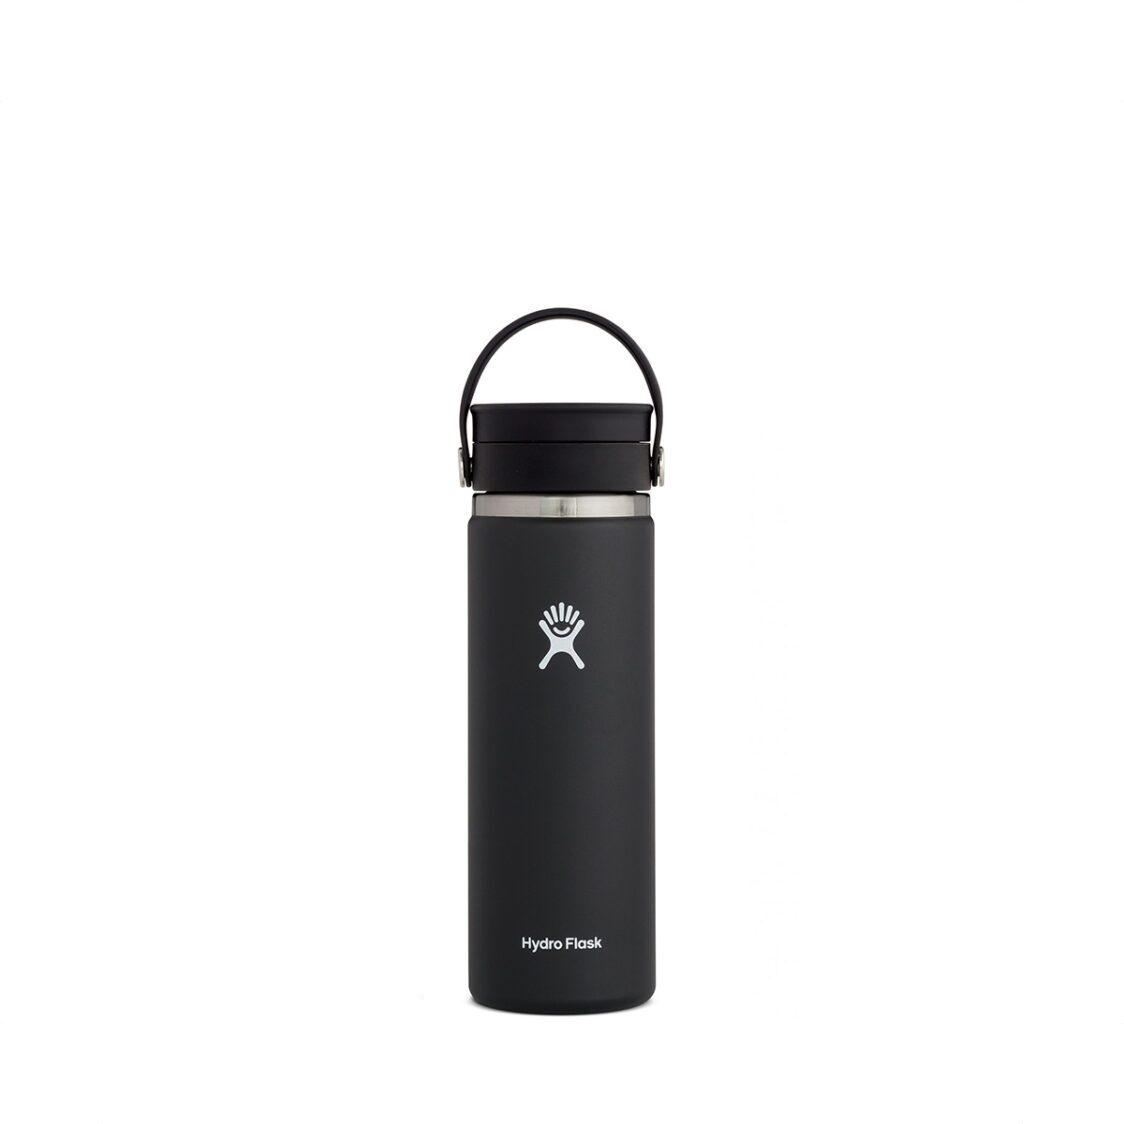 Hydro Flask Wide Mouth Flex Sip Lid 20oz Black